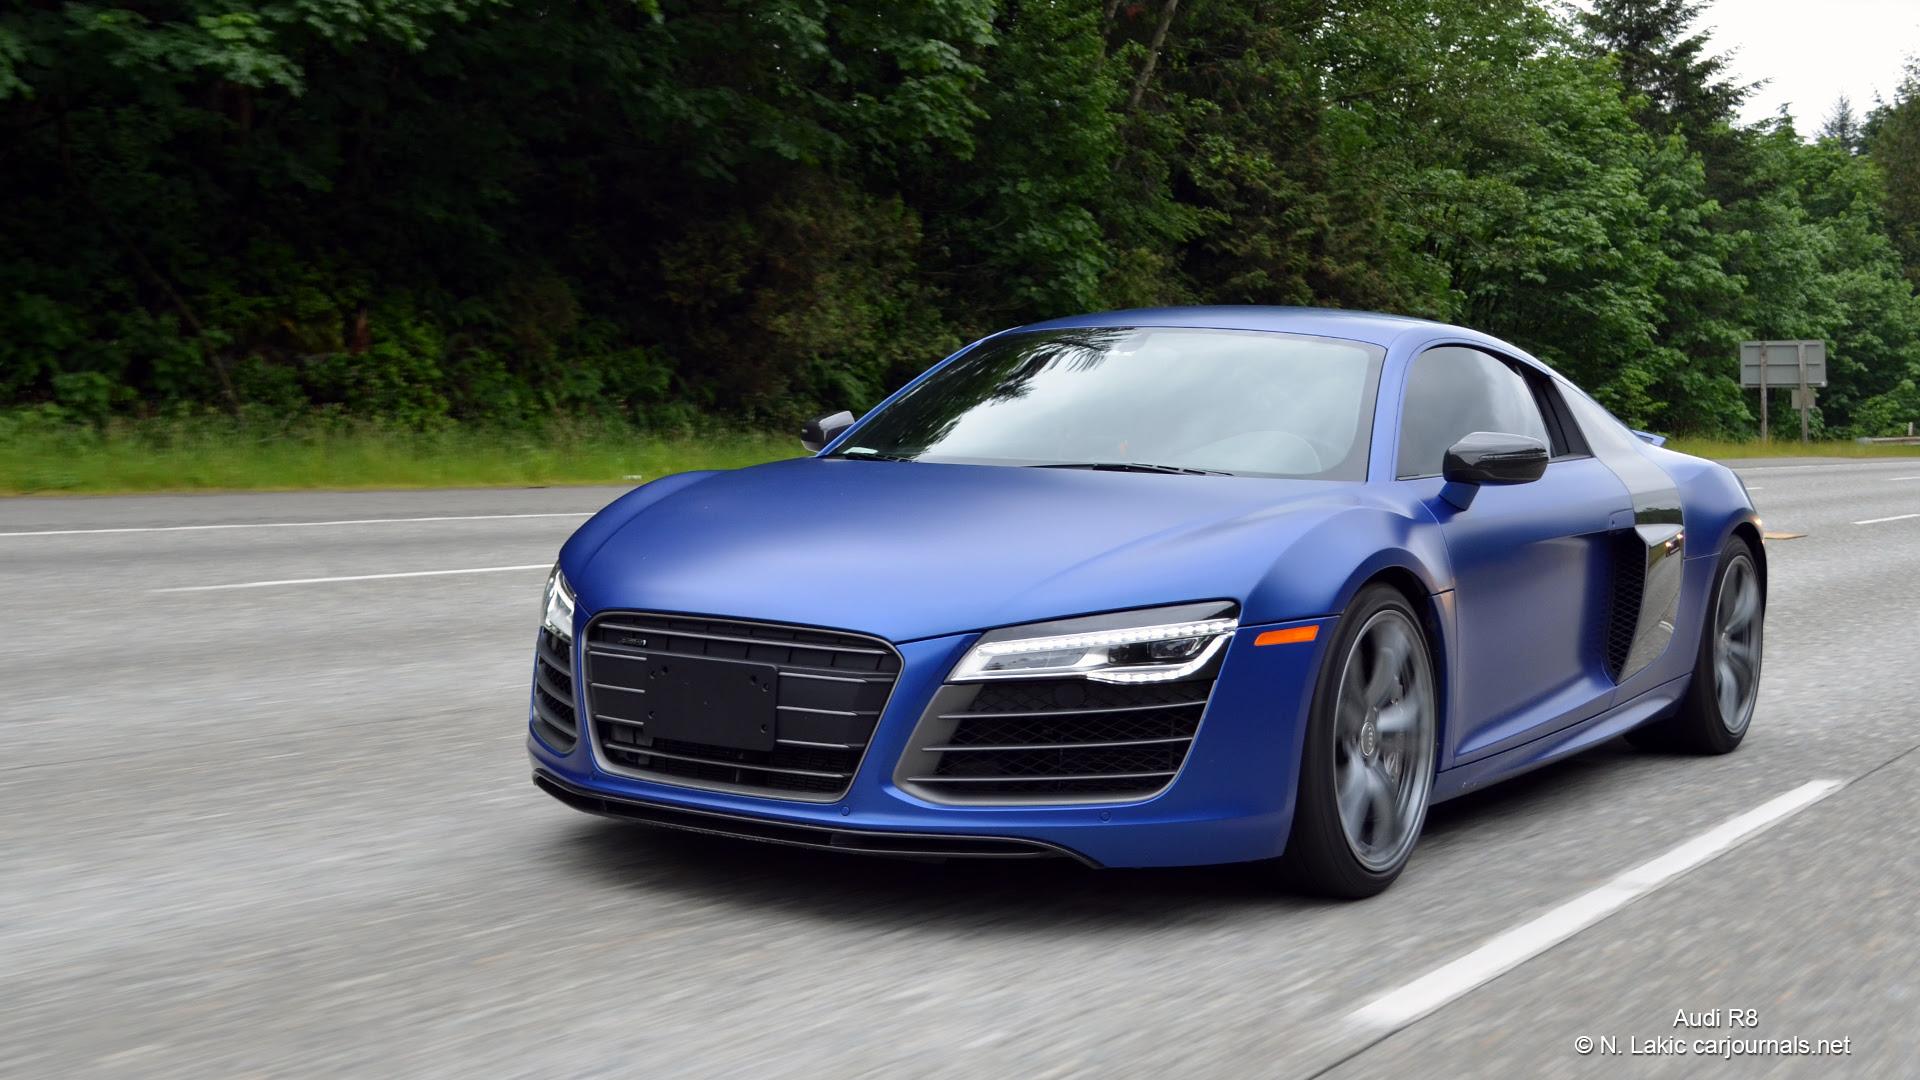 HD Car Wallpapers - Blue Audi R8 - Car Journals